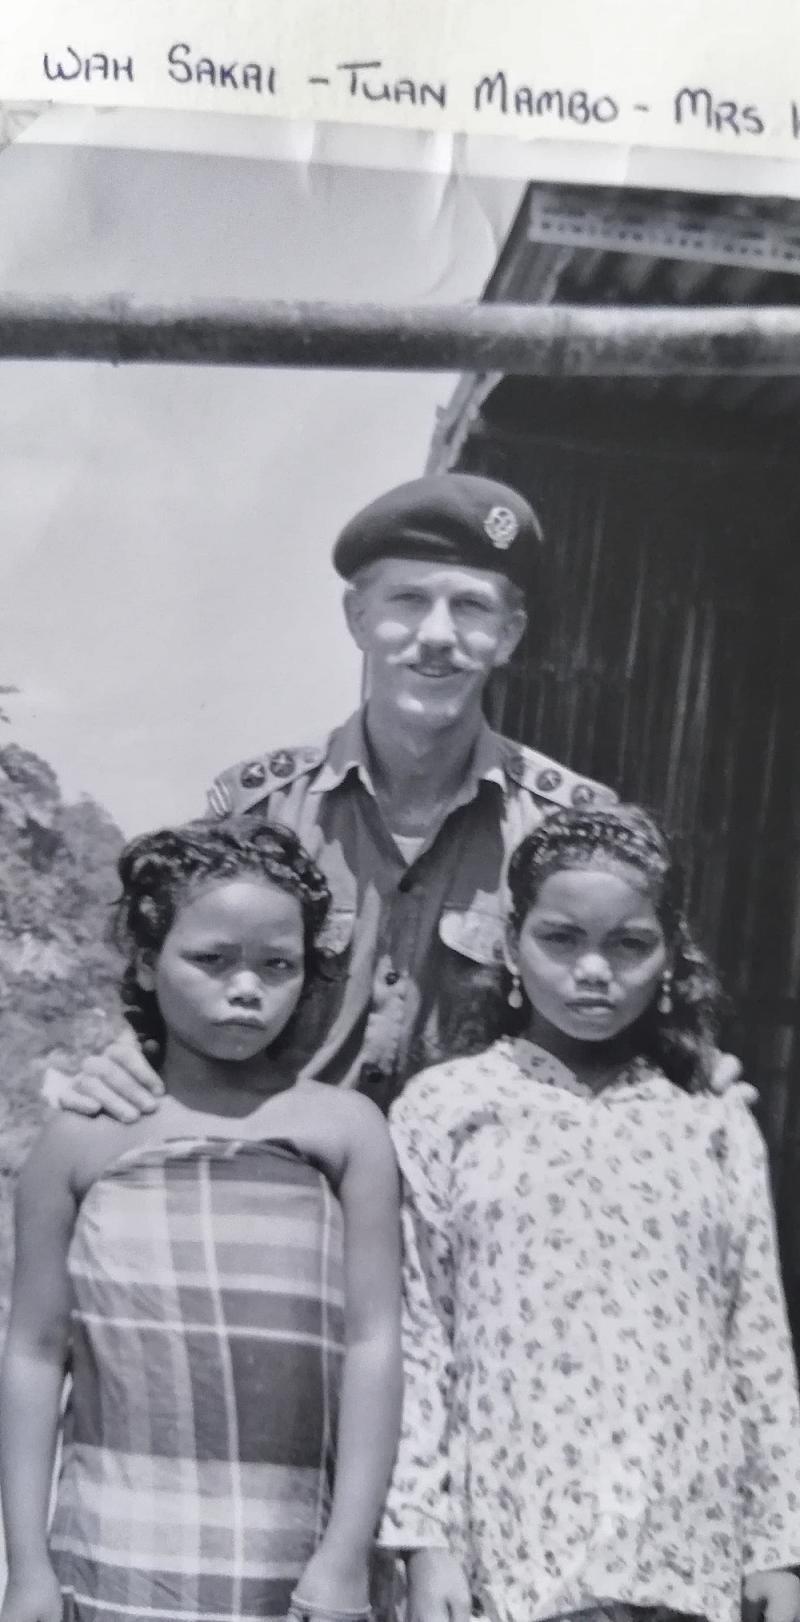 Lt. Peter Julius poses with two Orang Asli females, whom he named as Wah Sakai (left) and Mrs. Kun. — Picture courtesy of Peter Julius